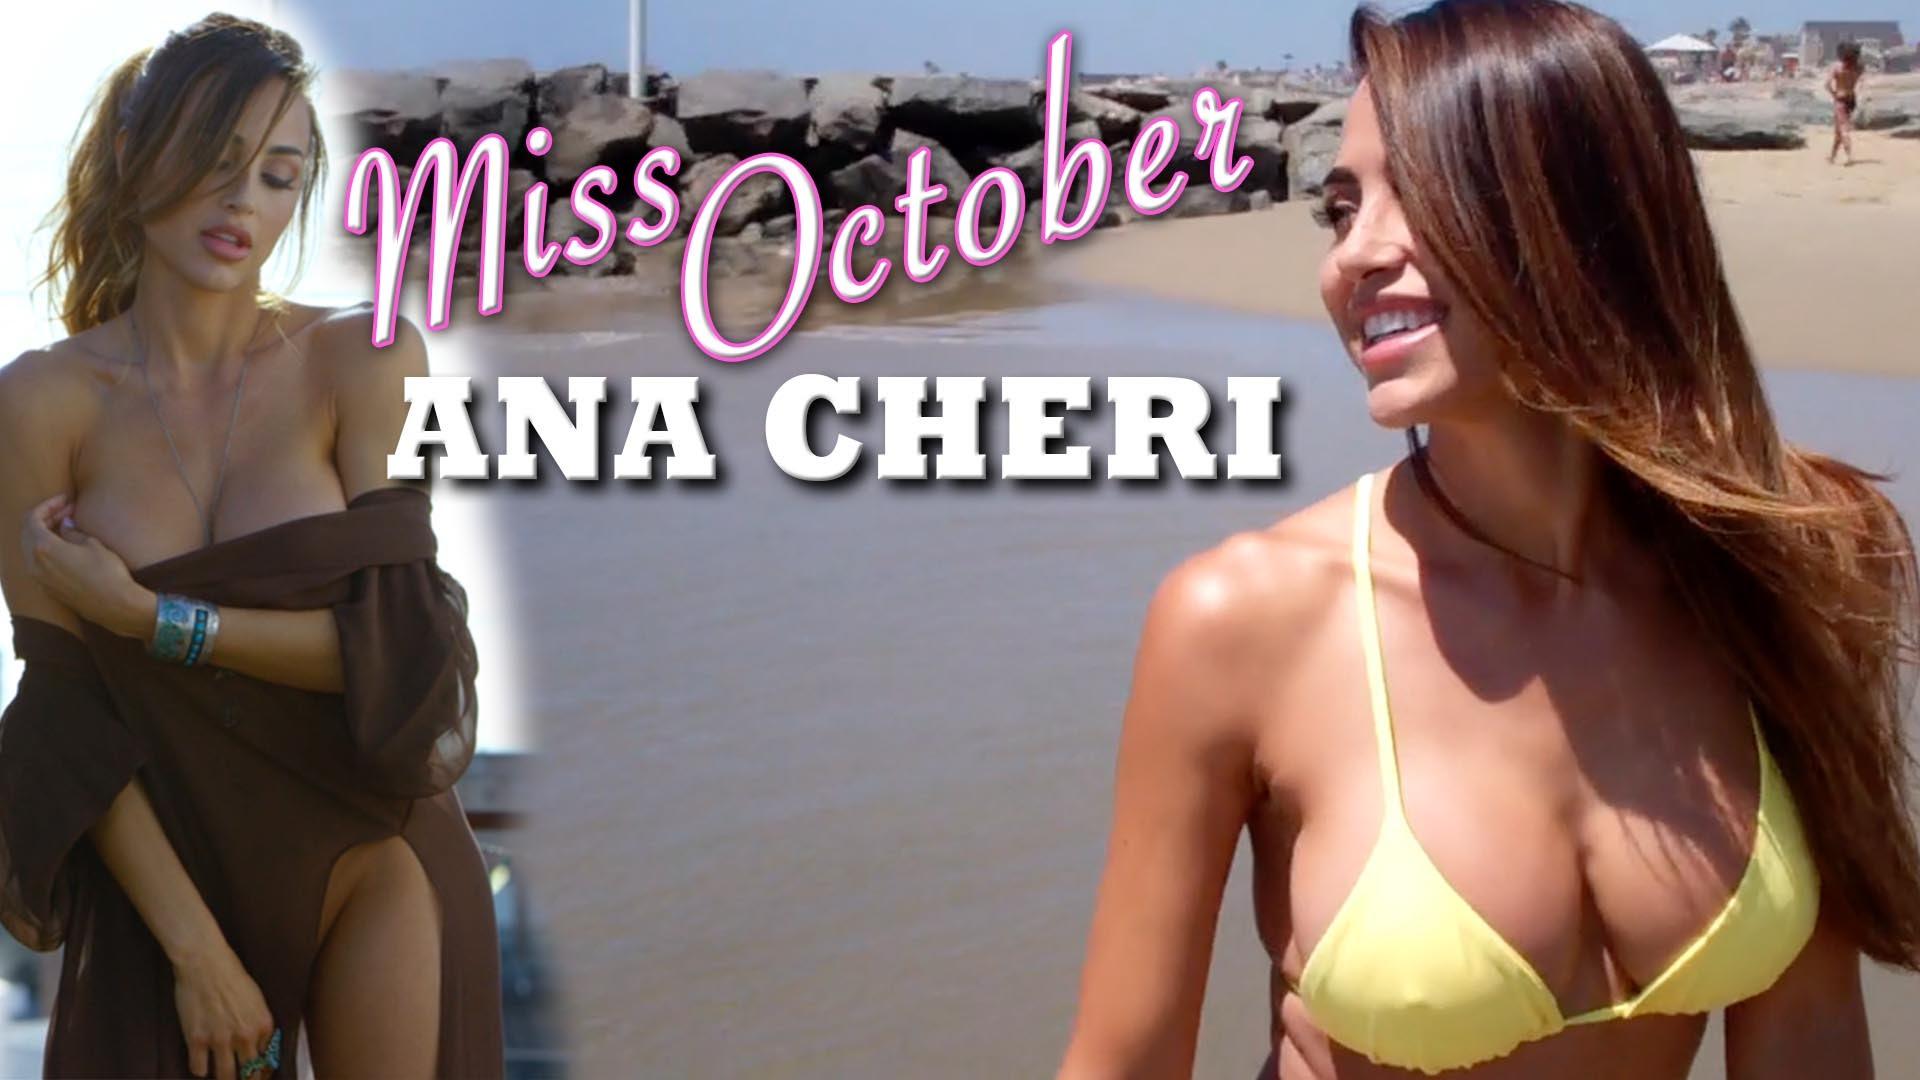 Ana Cheri – Miss outubro de 2015